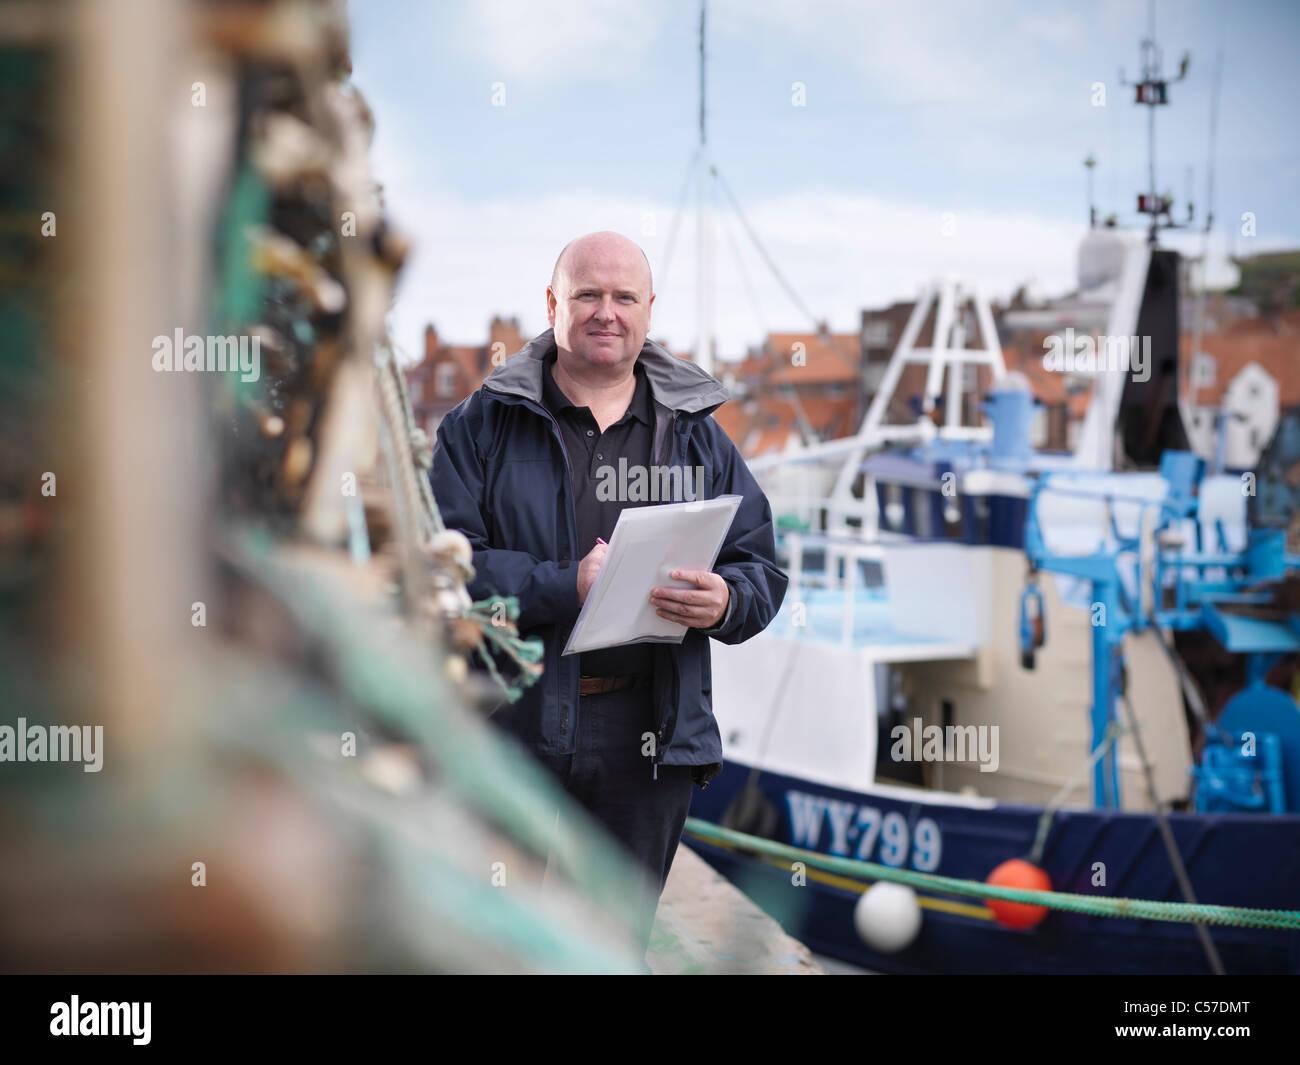 Fish inspector on fishing boat - Stock Image